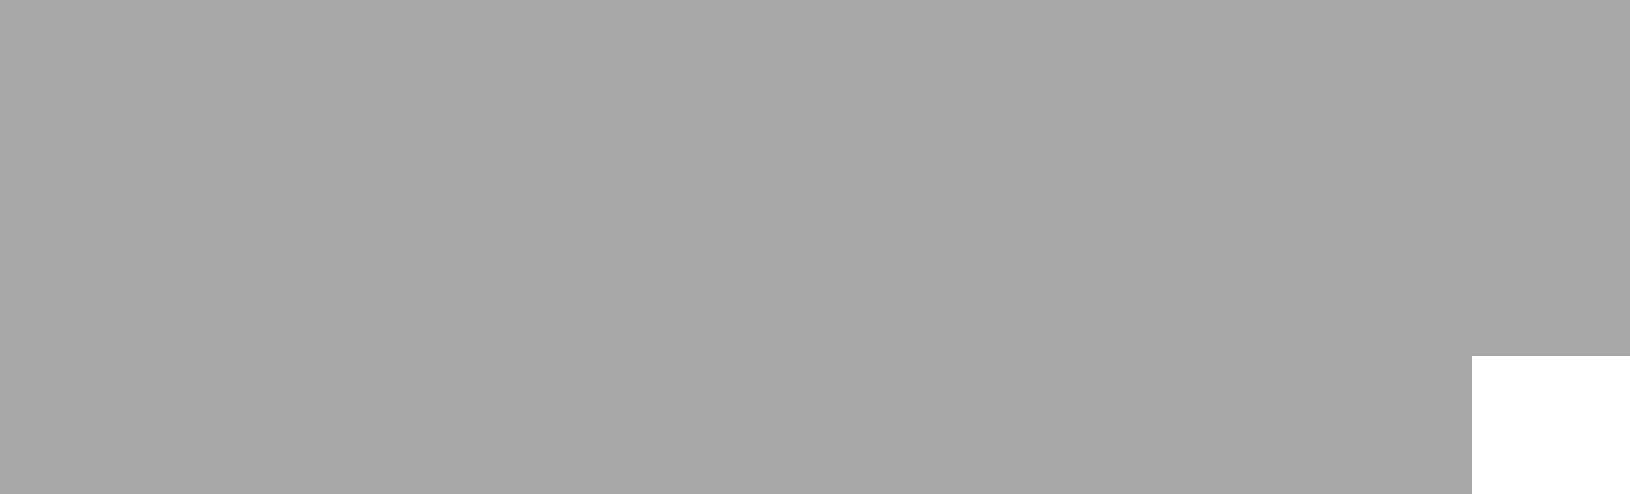 James-Avery-Jewelry-gray